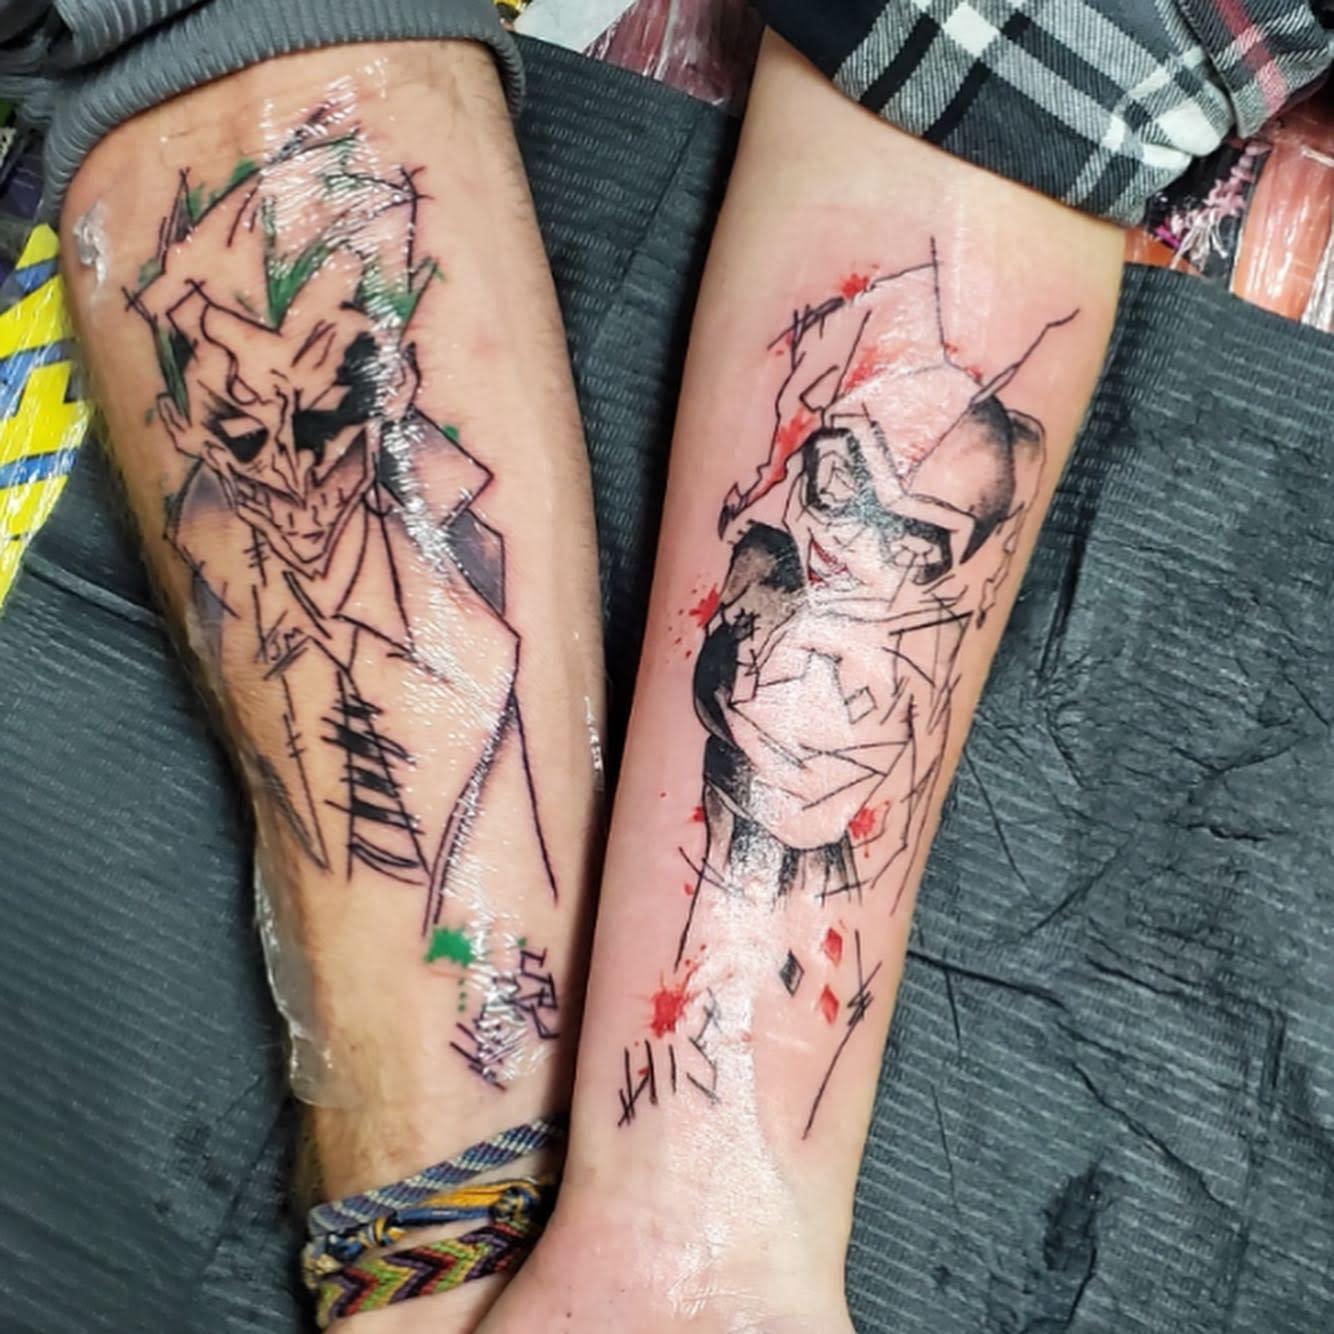 Couple Harley Quinn Tattoo Ideas -teeceesworld